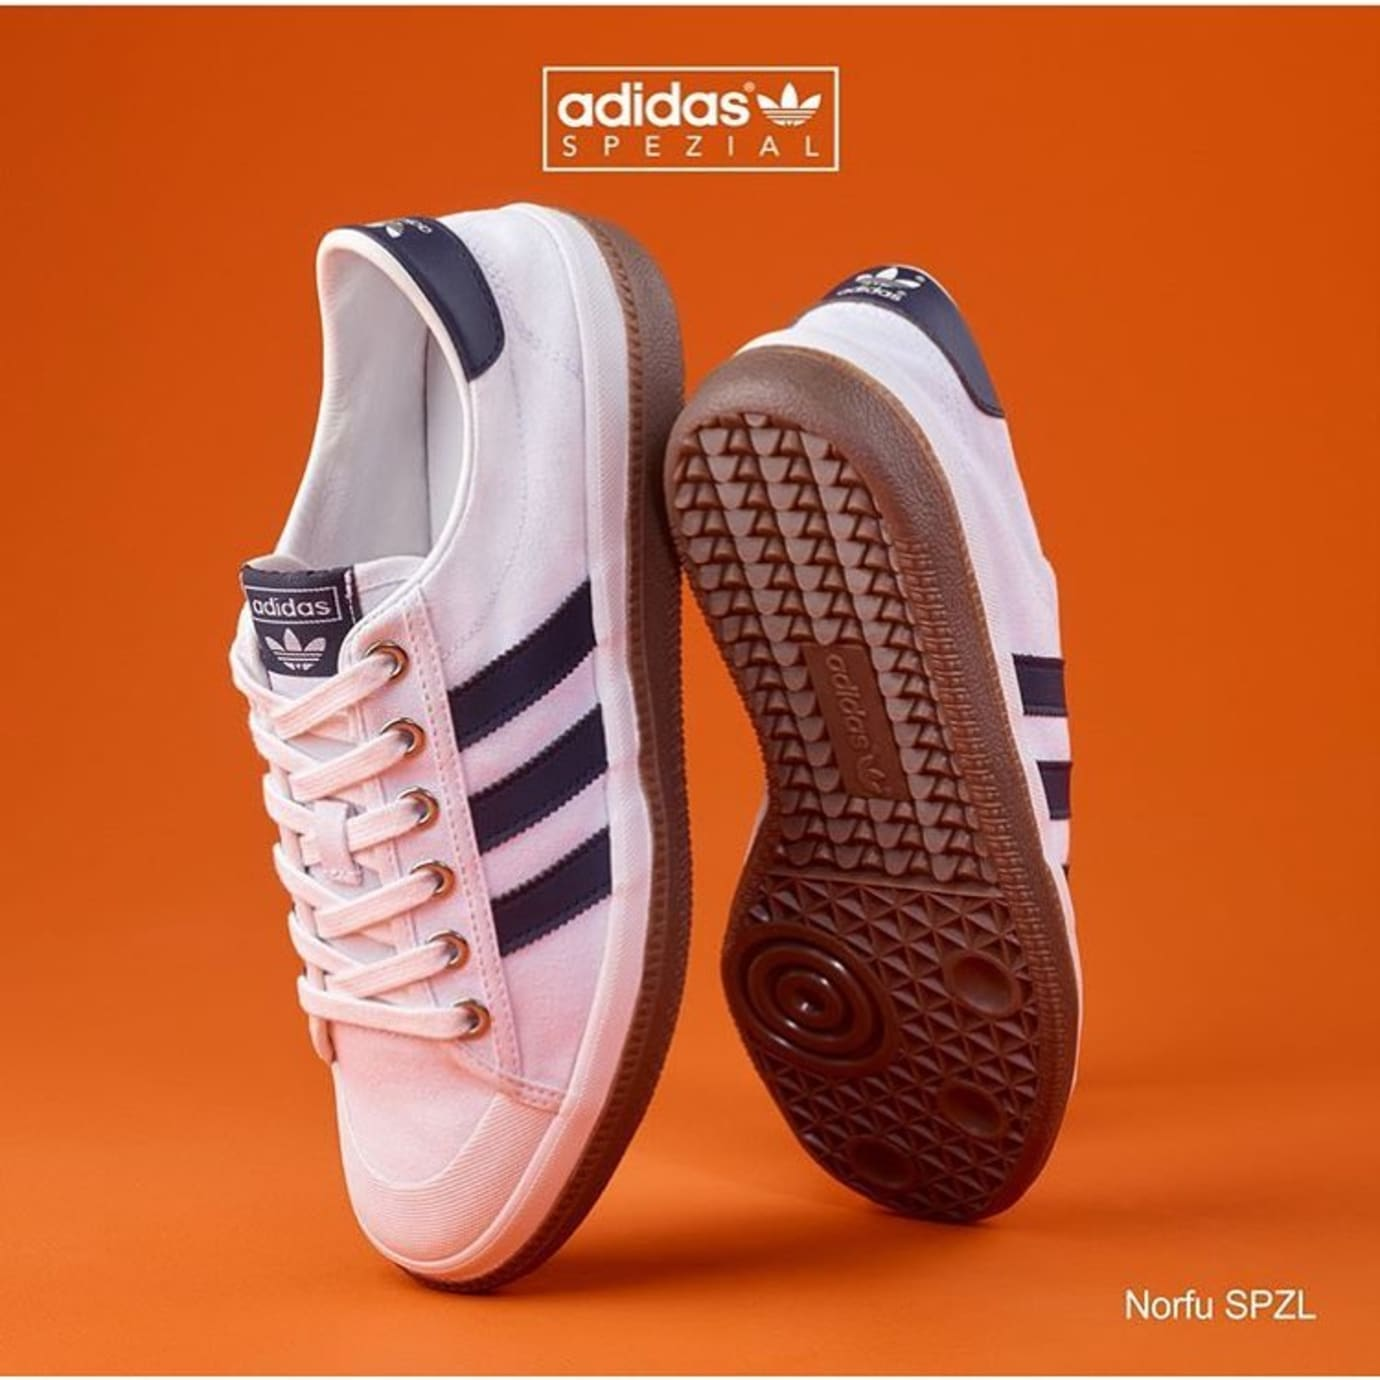 Adidas Spezial Printemps / Été 2019 Norfu